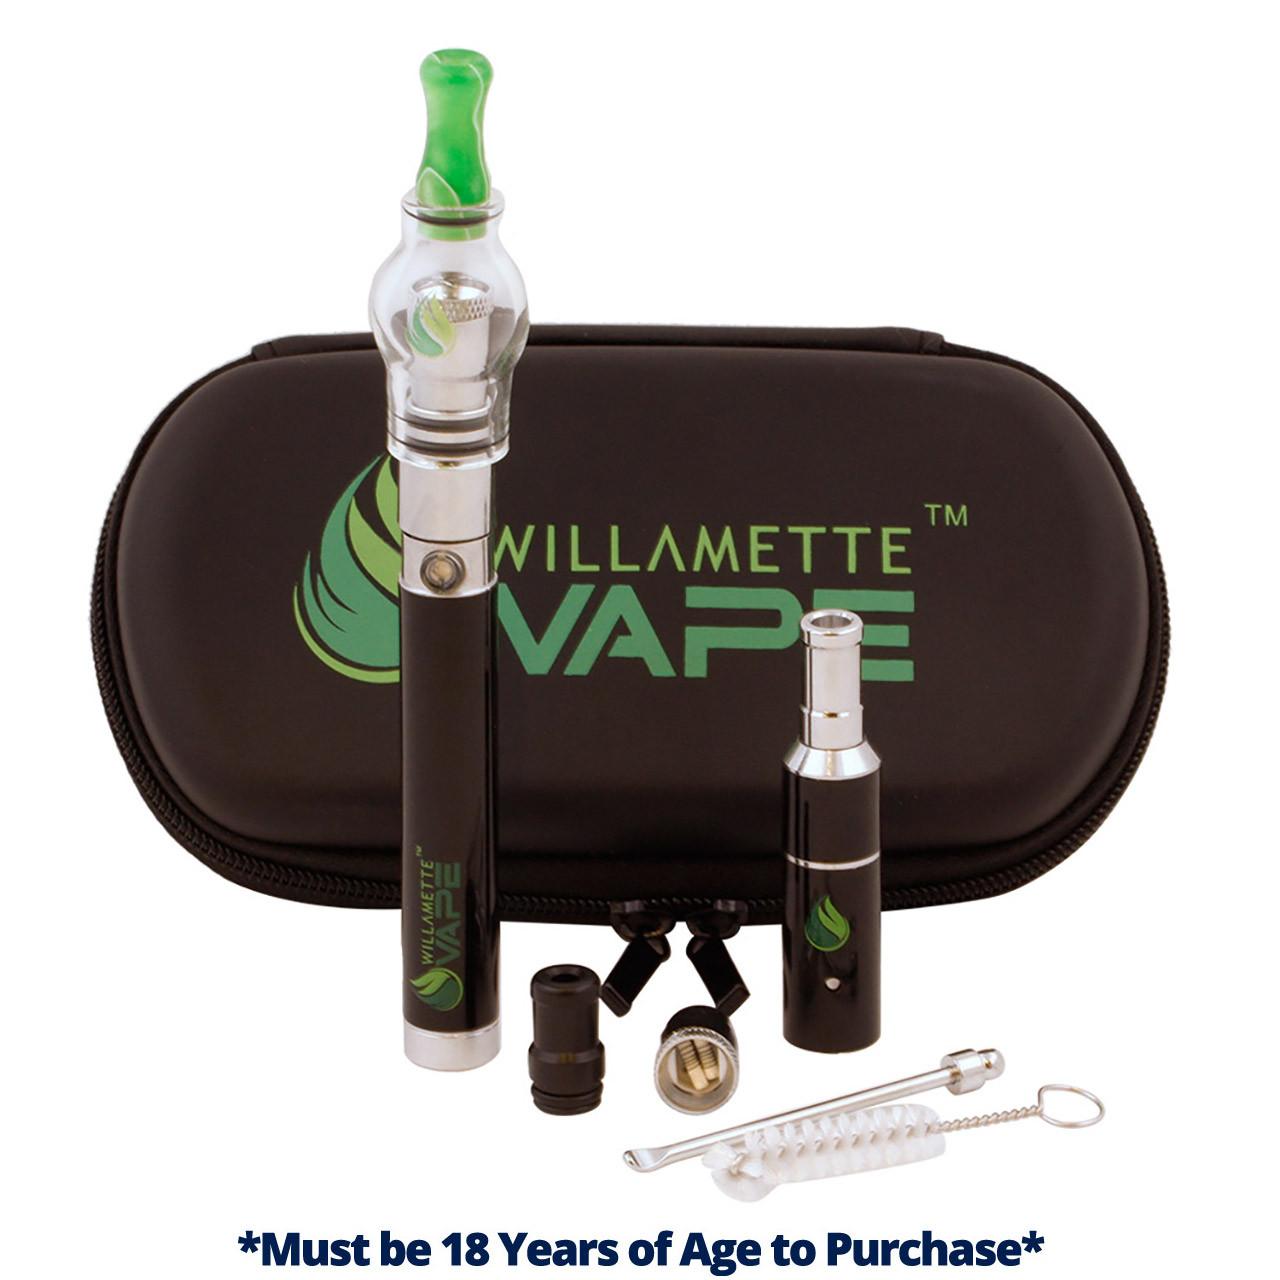 Willamette Vape Kit | Wax, Oil & Dry Herb